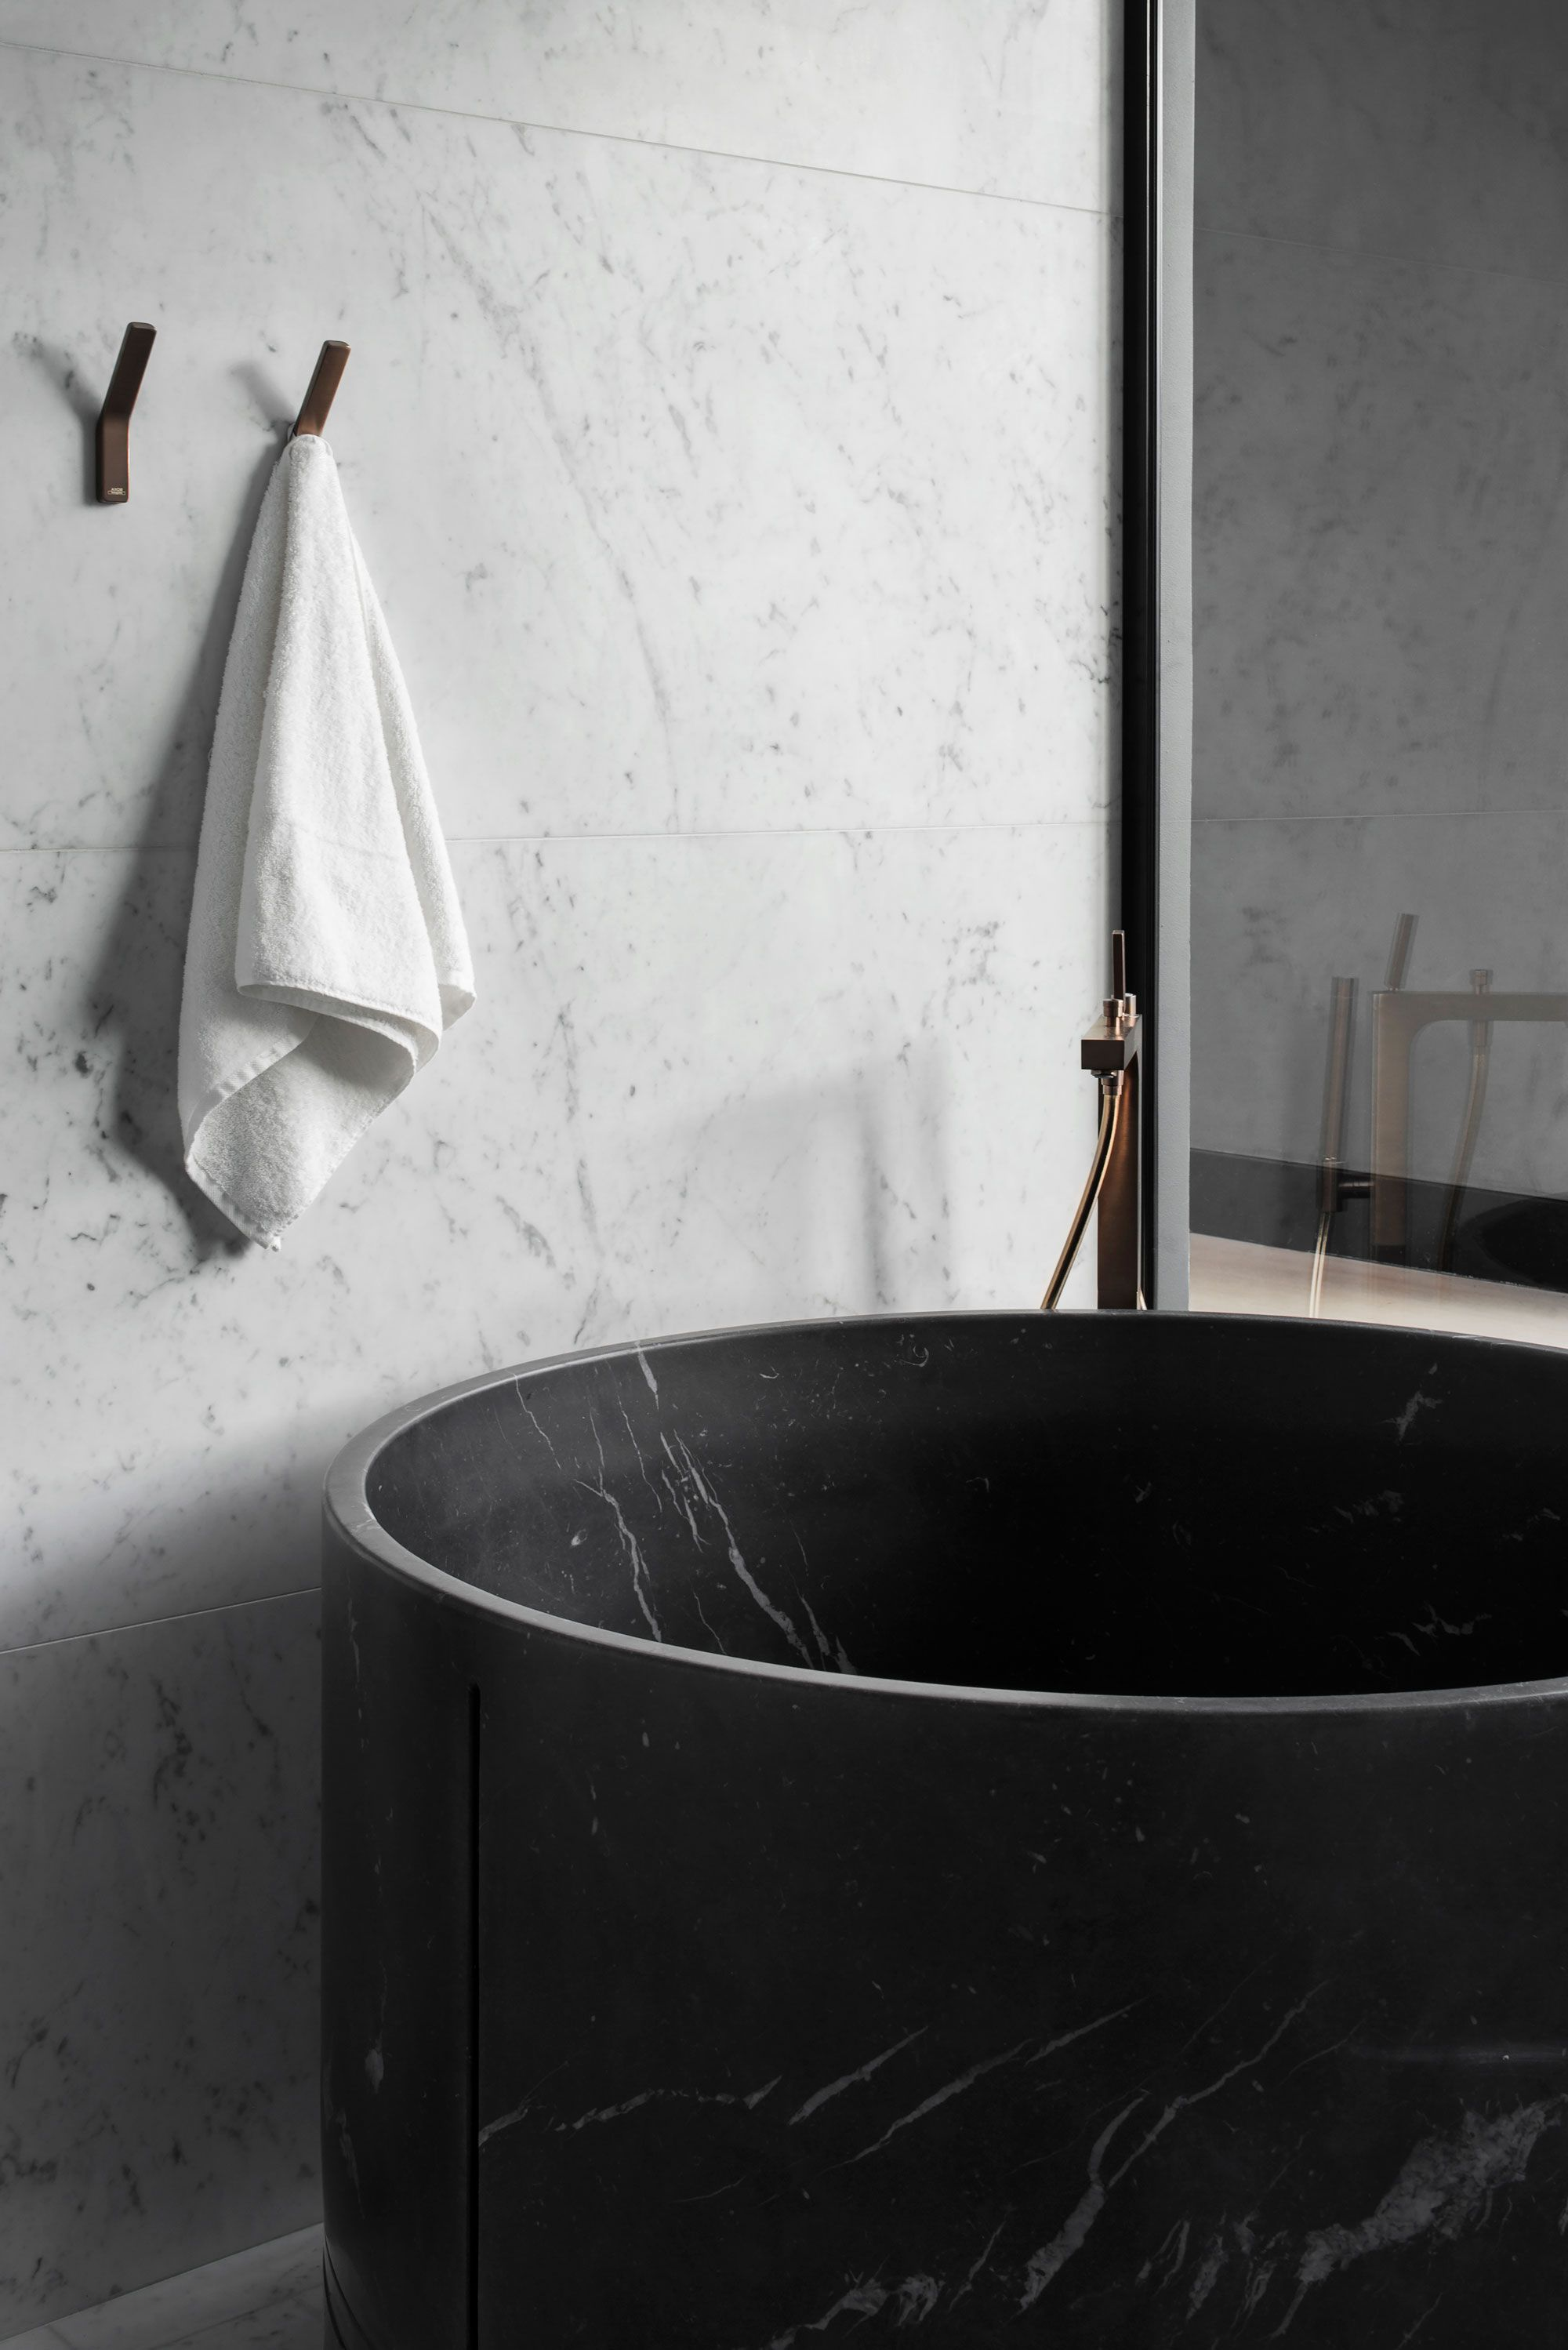 At Six Hotel | Studio, Washroom and Interiors